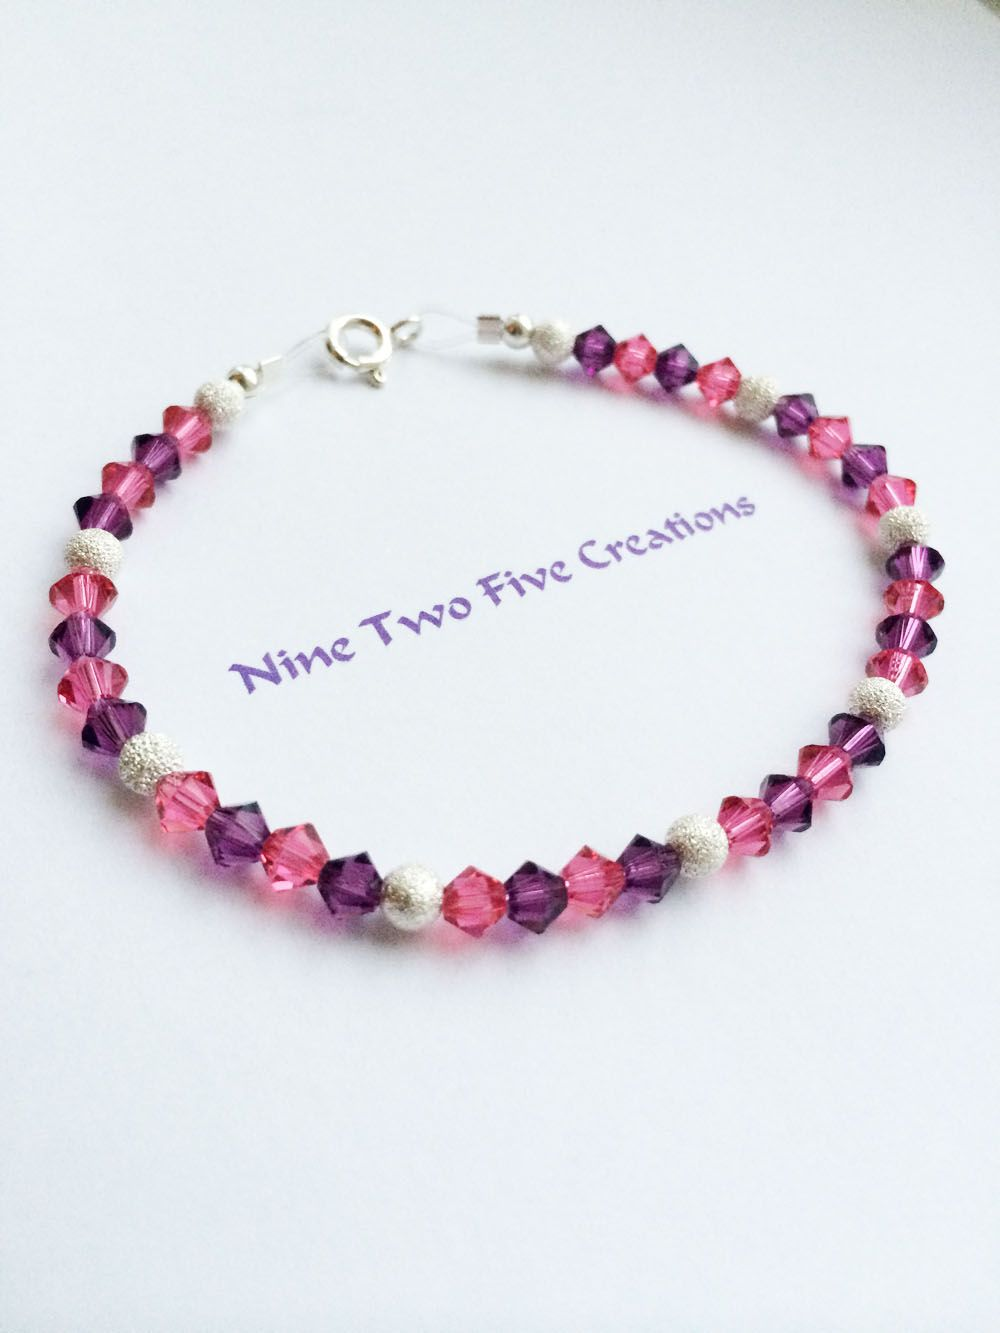 2bb8505c8505e6 Swarovski crystal and stardust bead clasp bracelet in purple velvet and  fushia Lila Samt